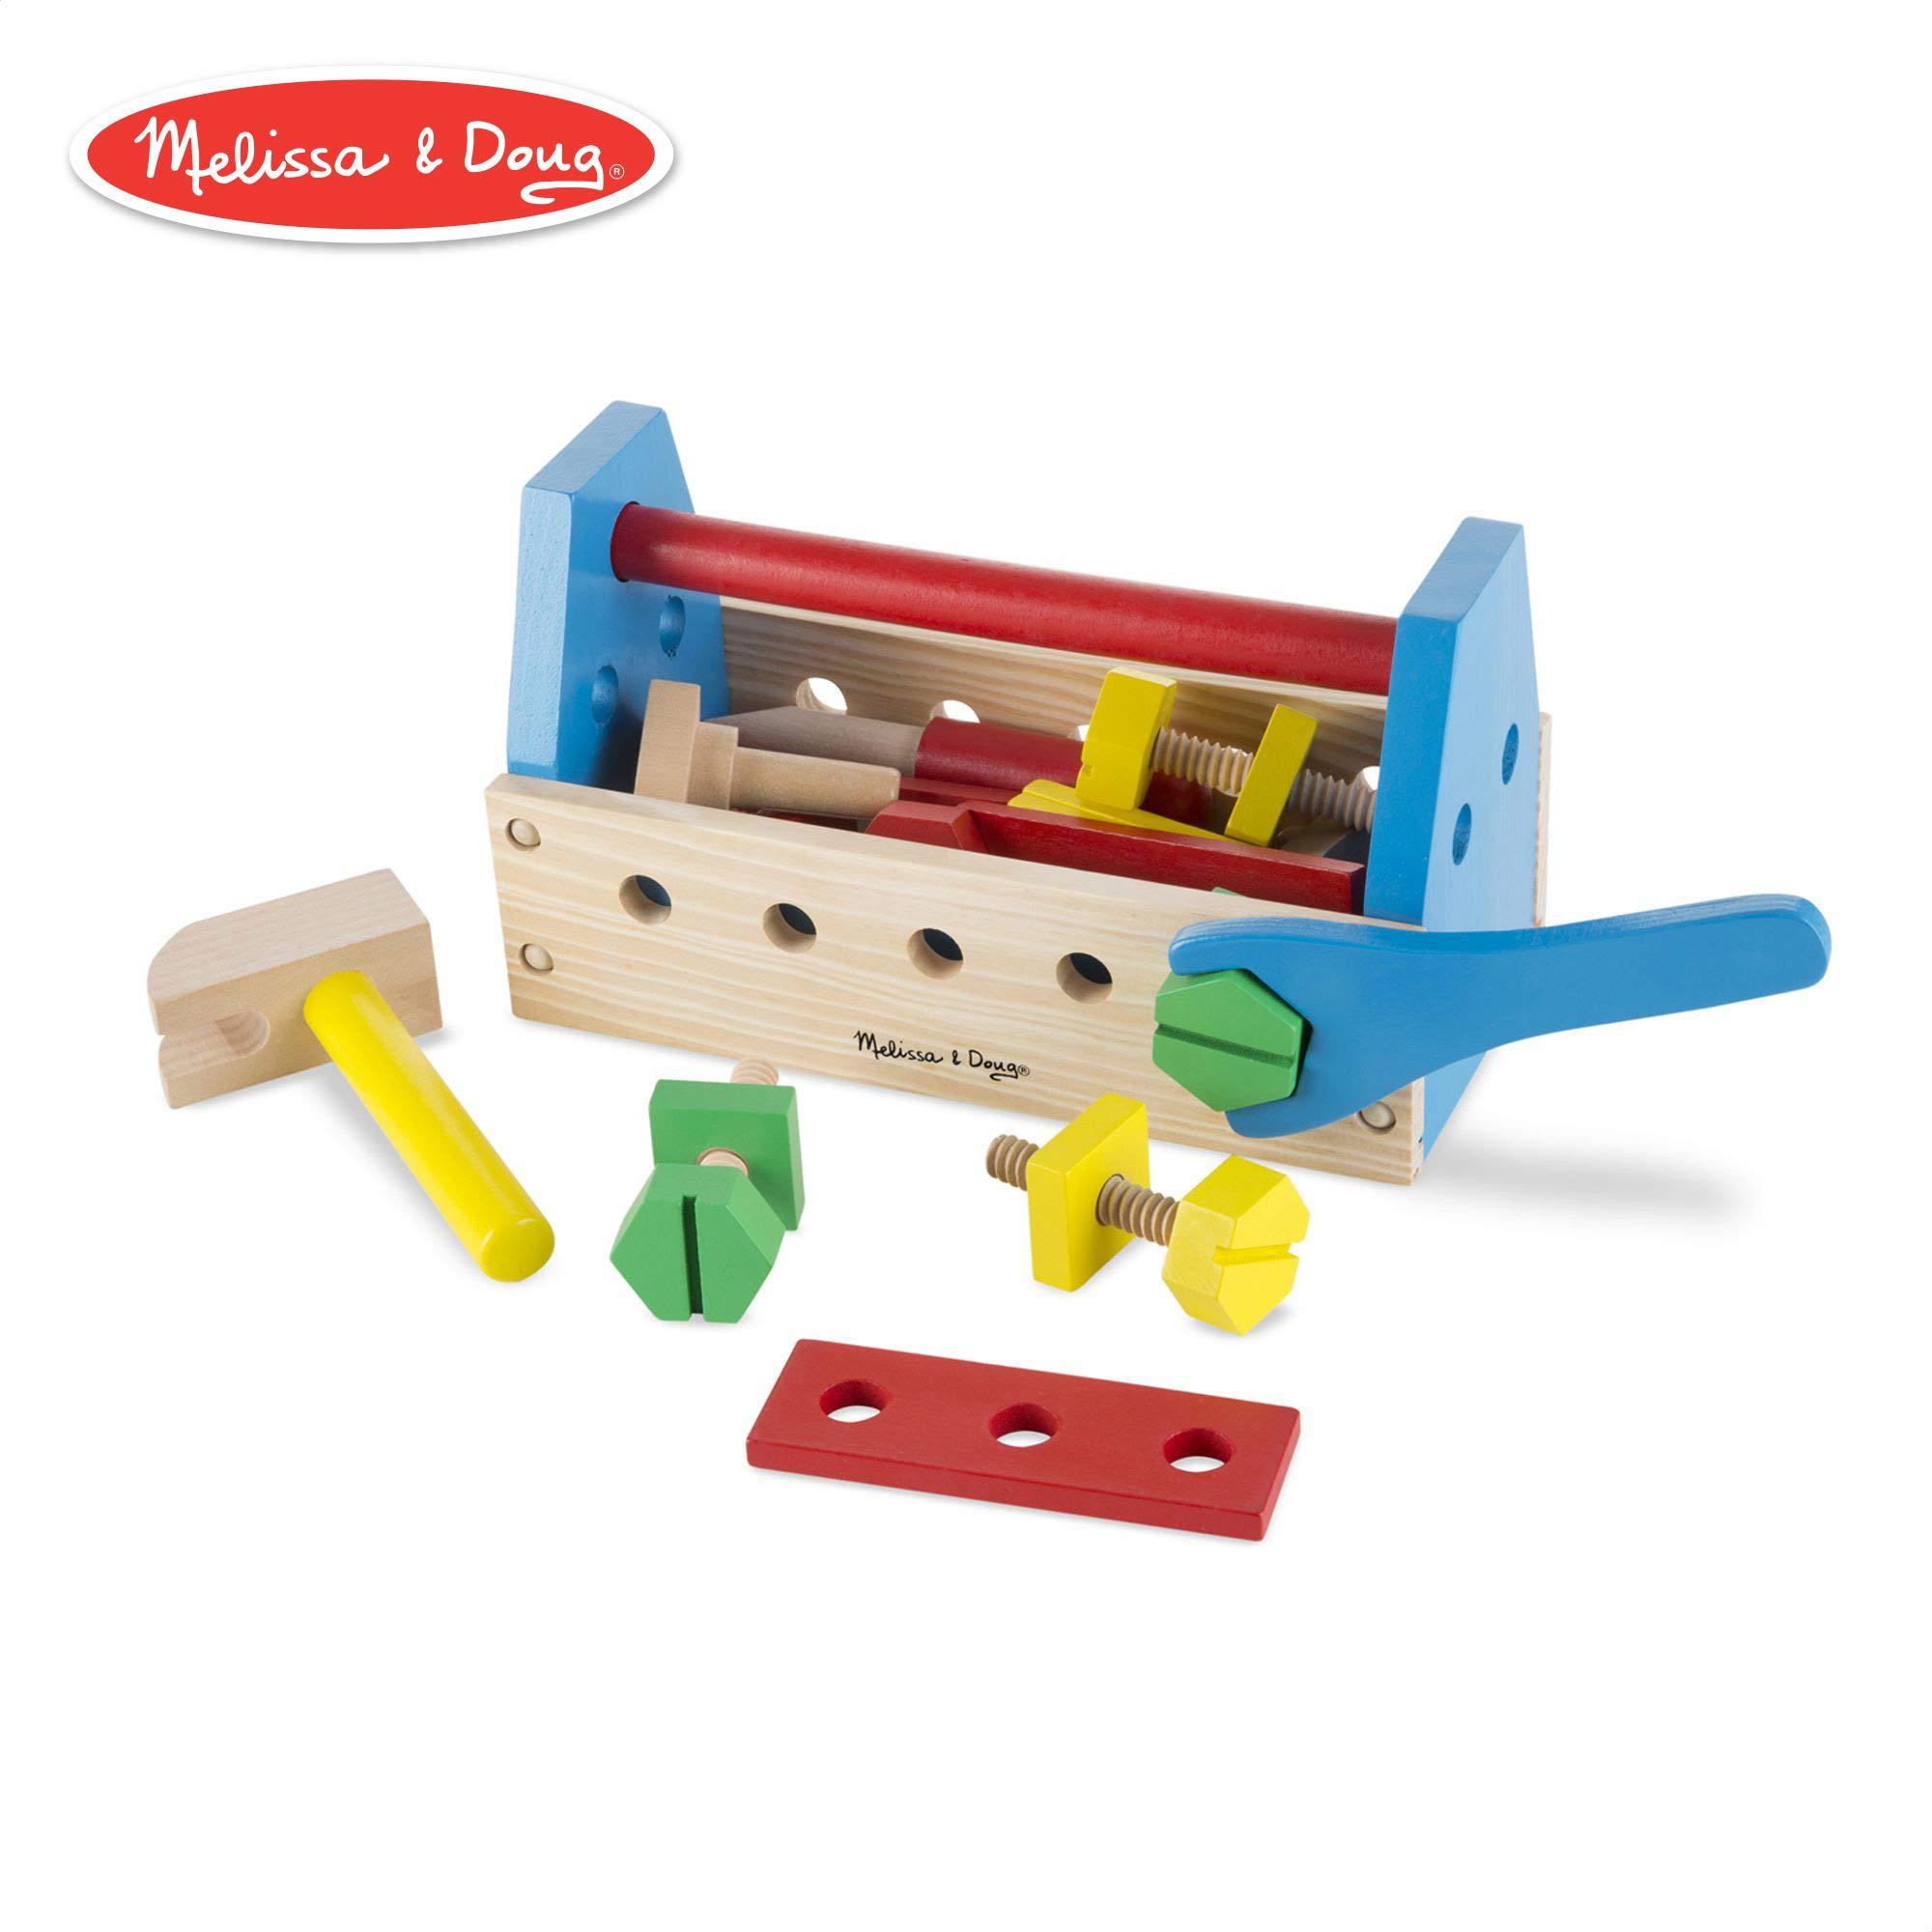 Melissa & Doug Take-Along Tool Kit Wooden Toy, Pretend Play, Sturdy Wooden Construction, Promotes Multiple Development Skills, 9.9'' H x 5.5'' W x 4.8'' L by Melissa & Doug